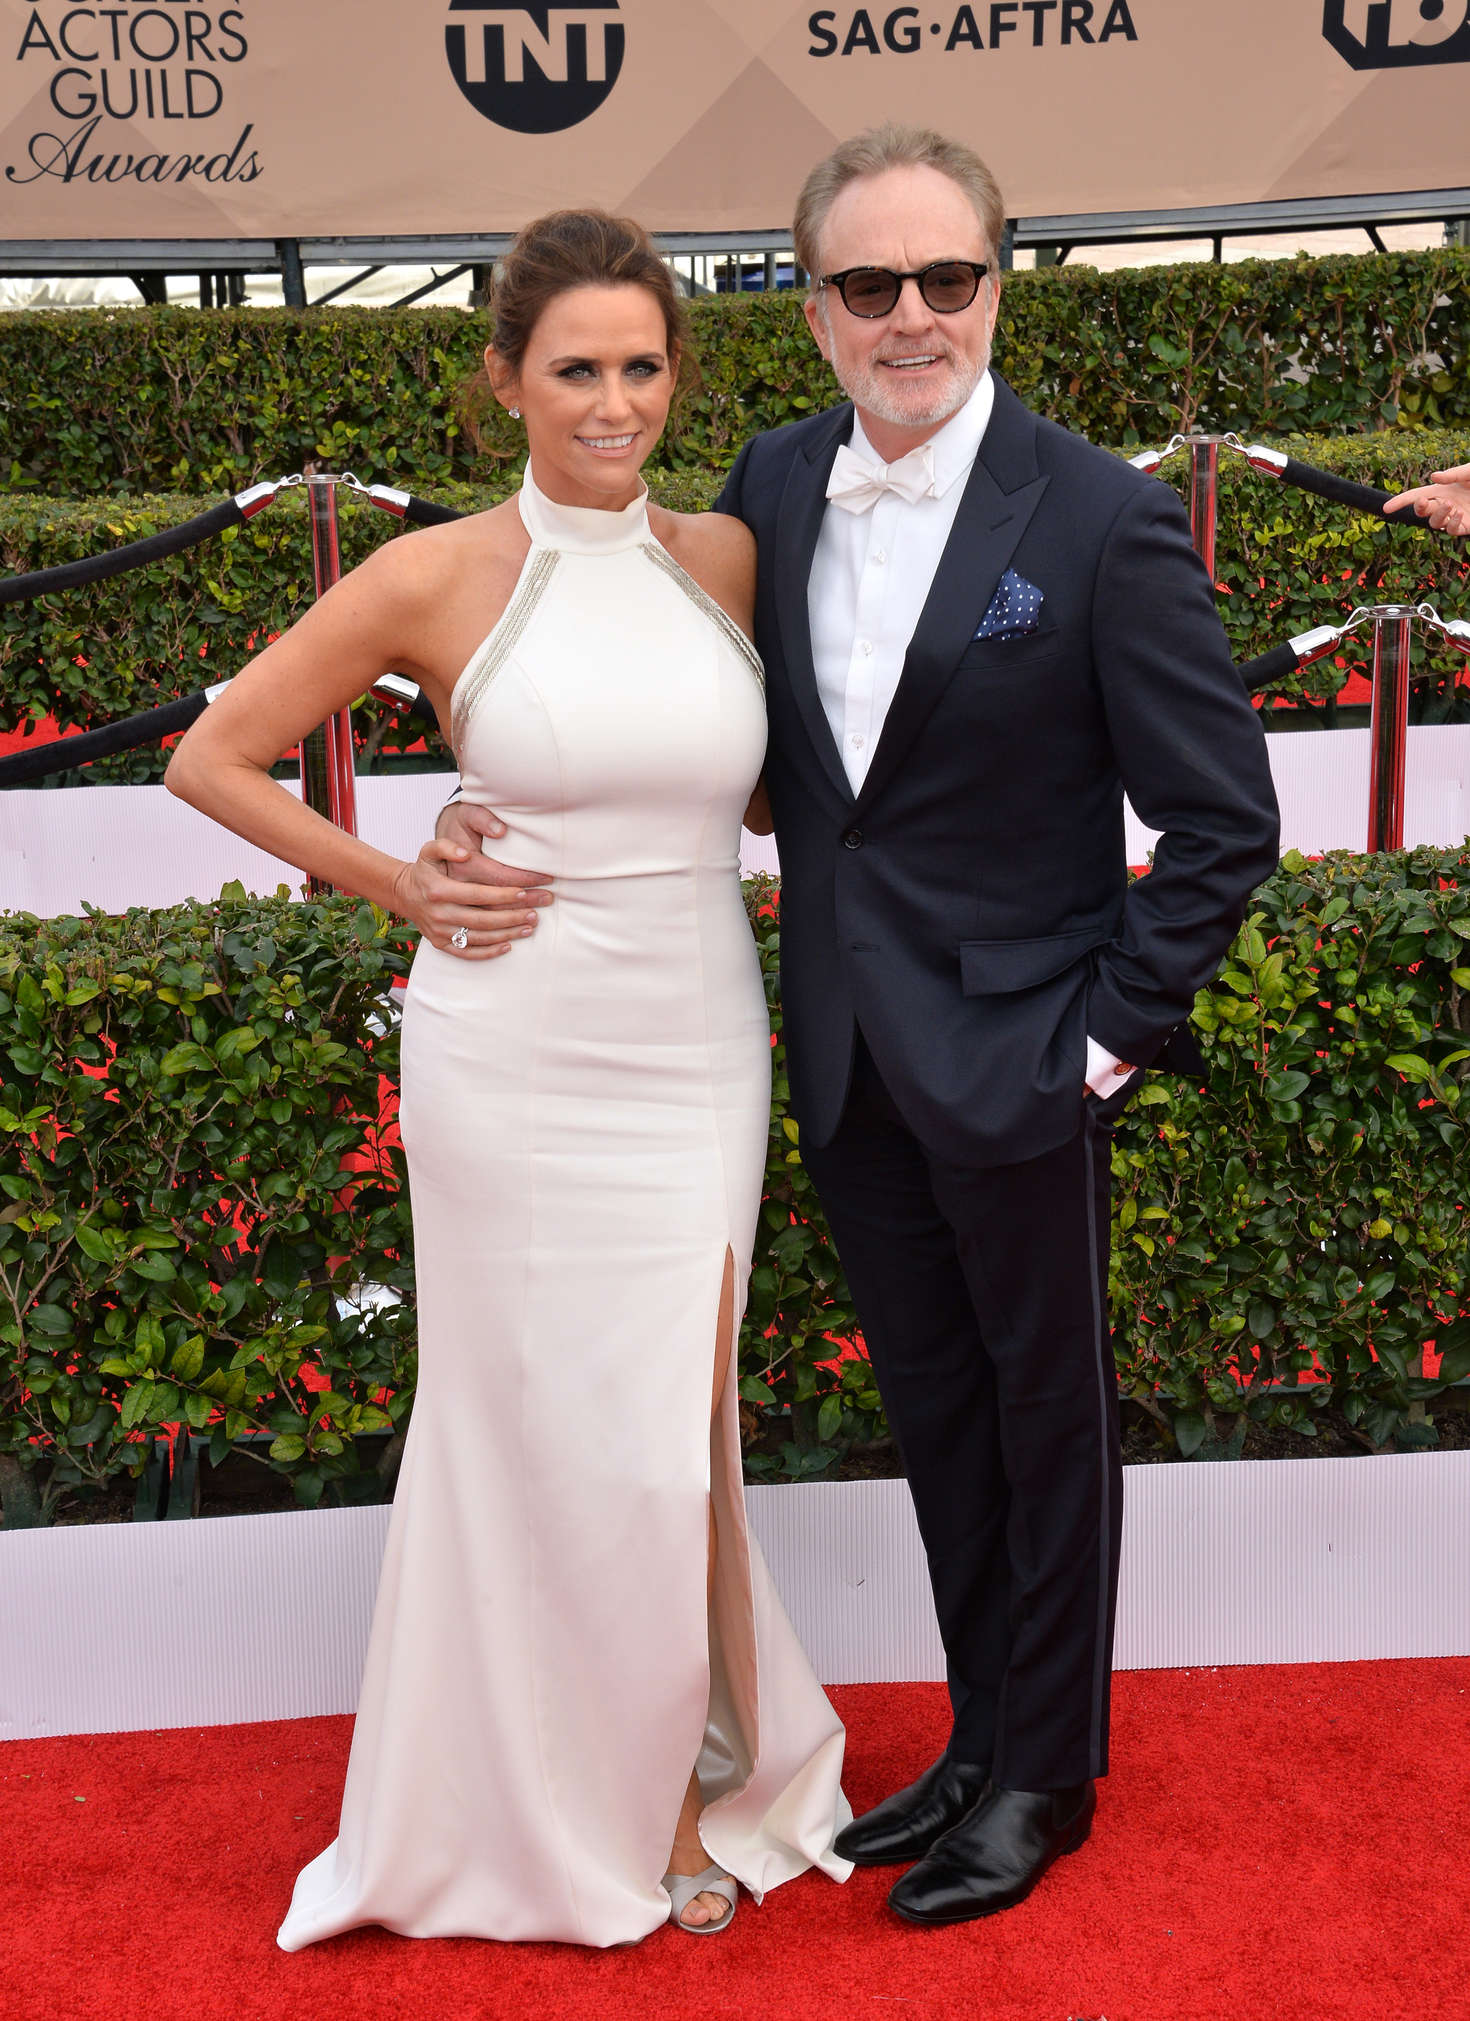 Amy Landecker Annual Screen Actors Guild Awards in Los Angeles